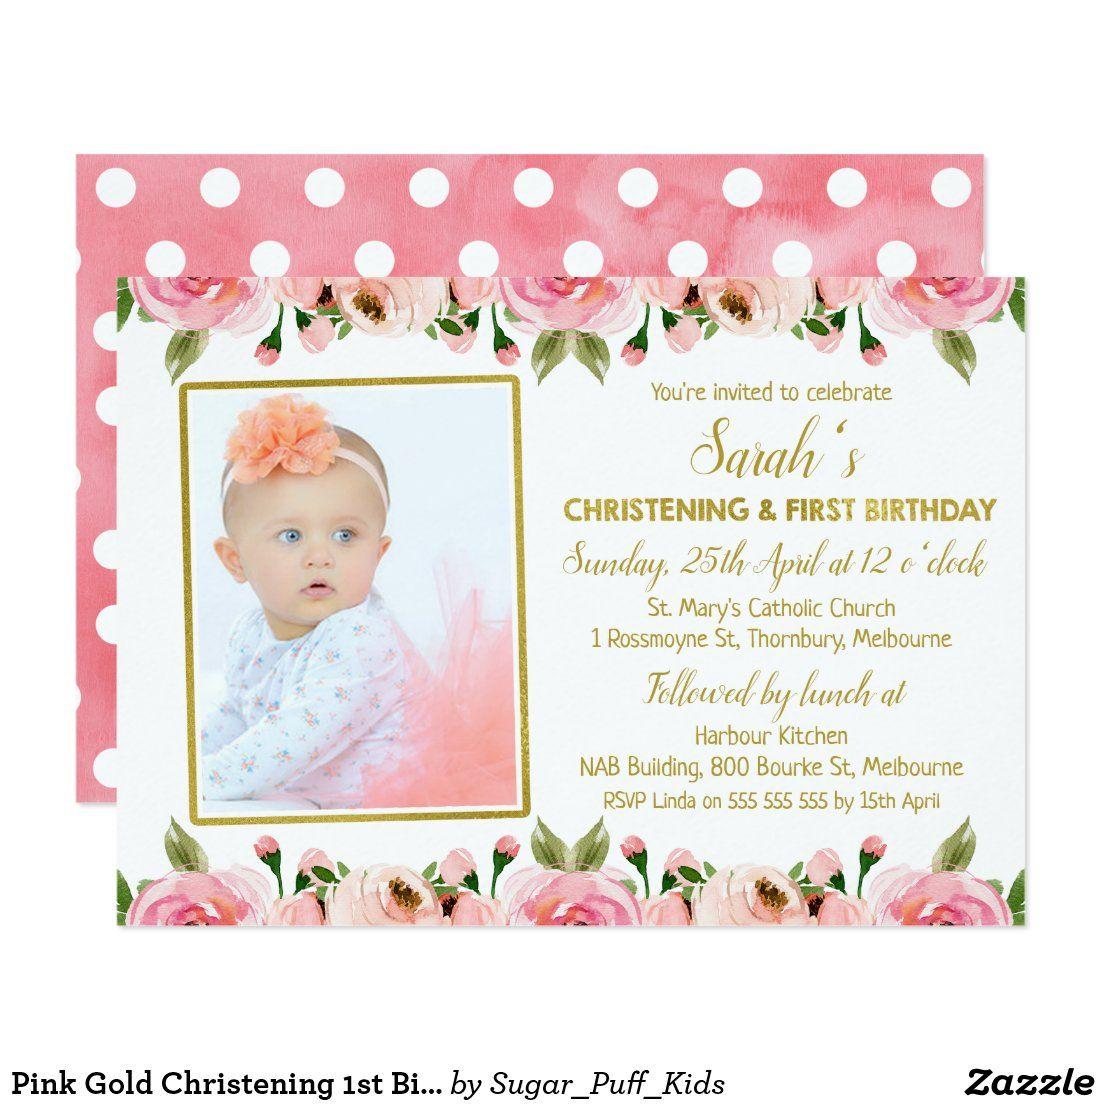 Pink Gold Christening 1st Birthday Invitation Zazzle Com 1st Birthday Invitations Christening Invitations Girl Birthday Invitations